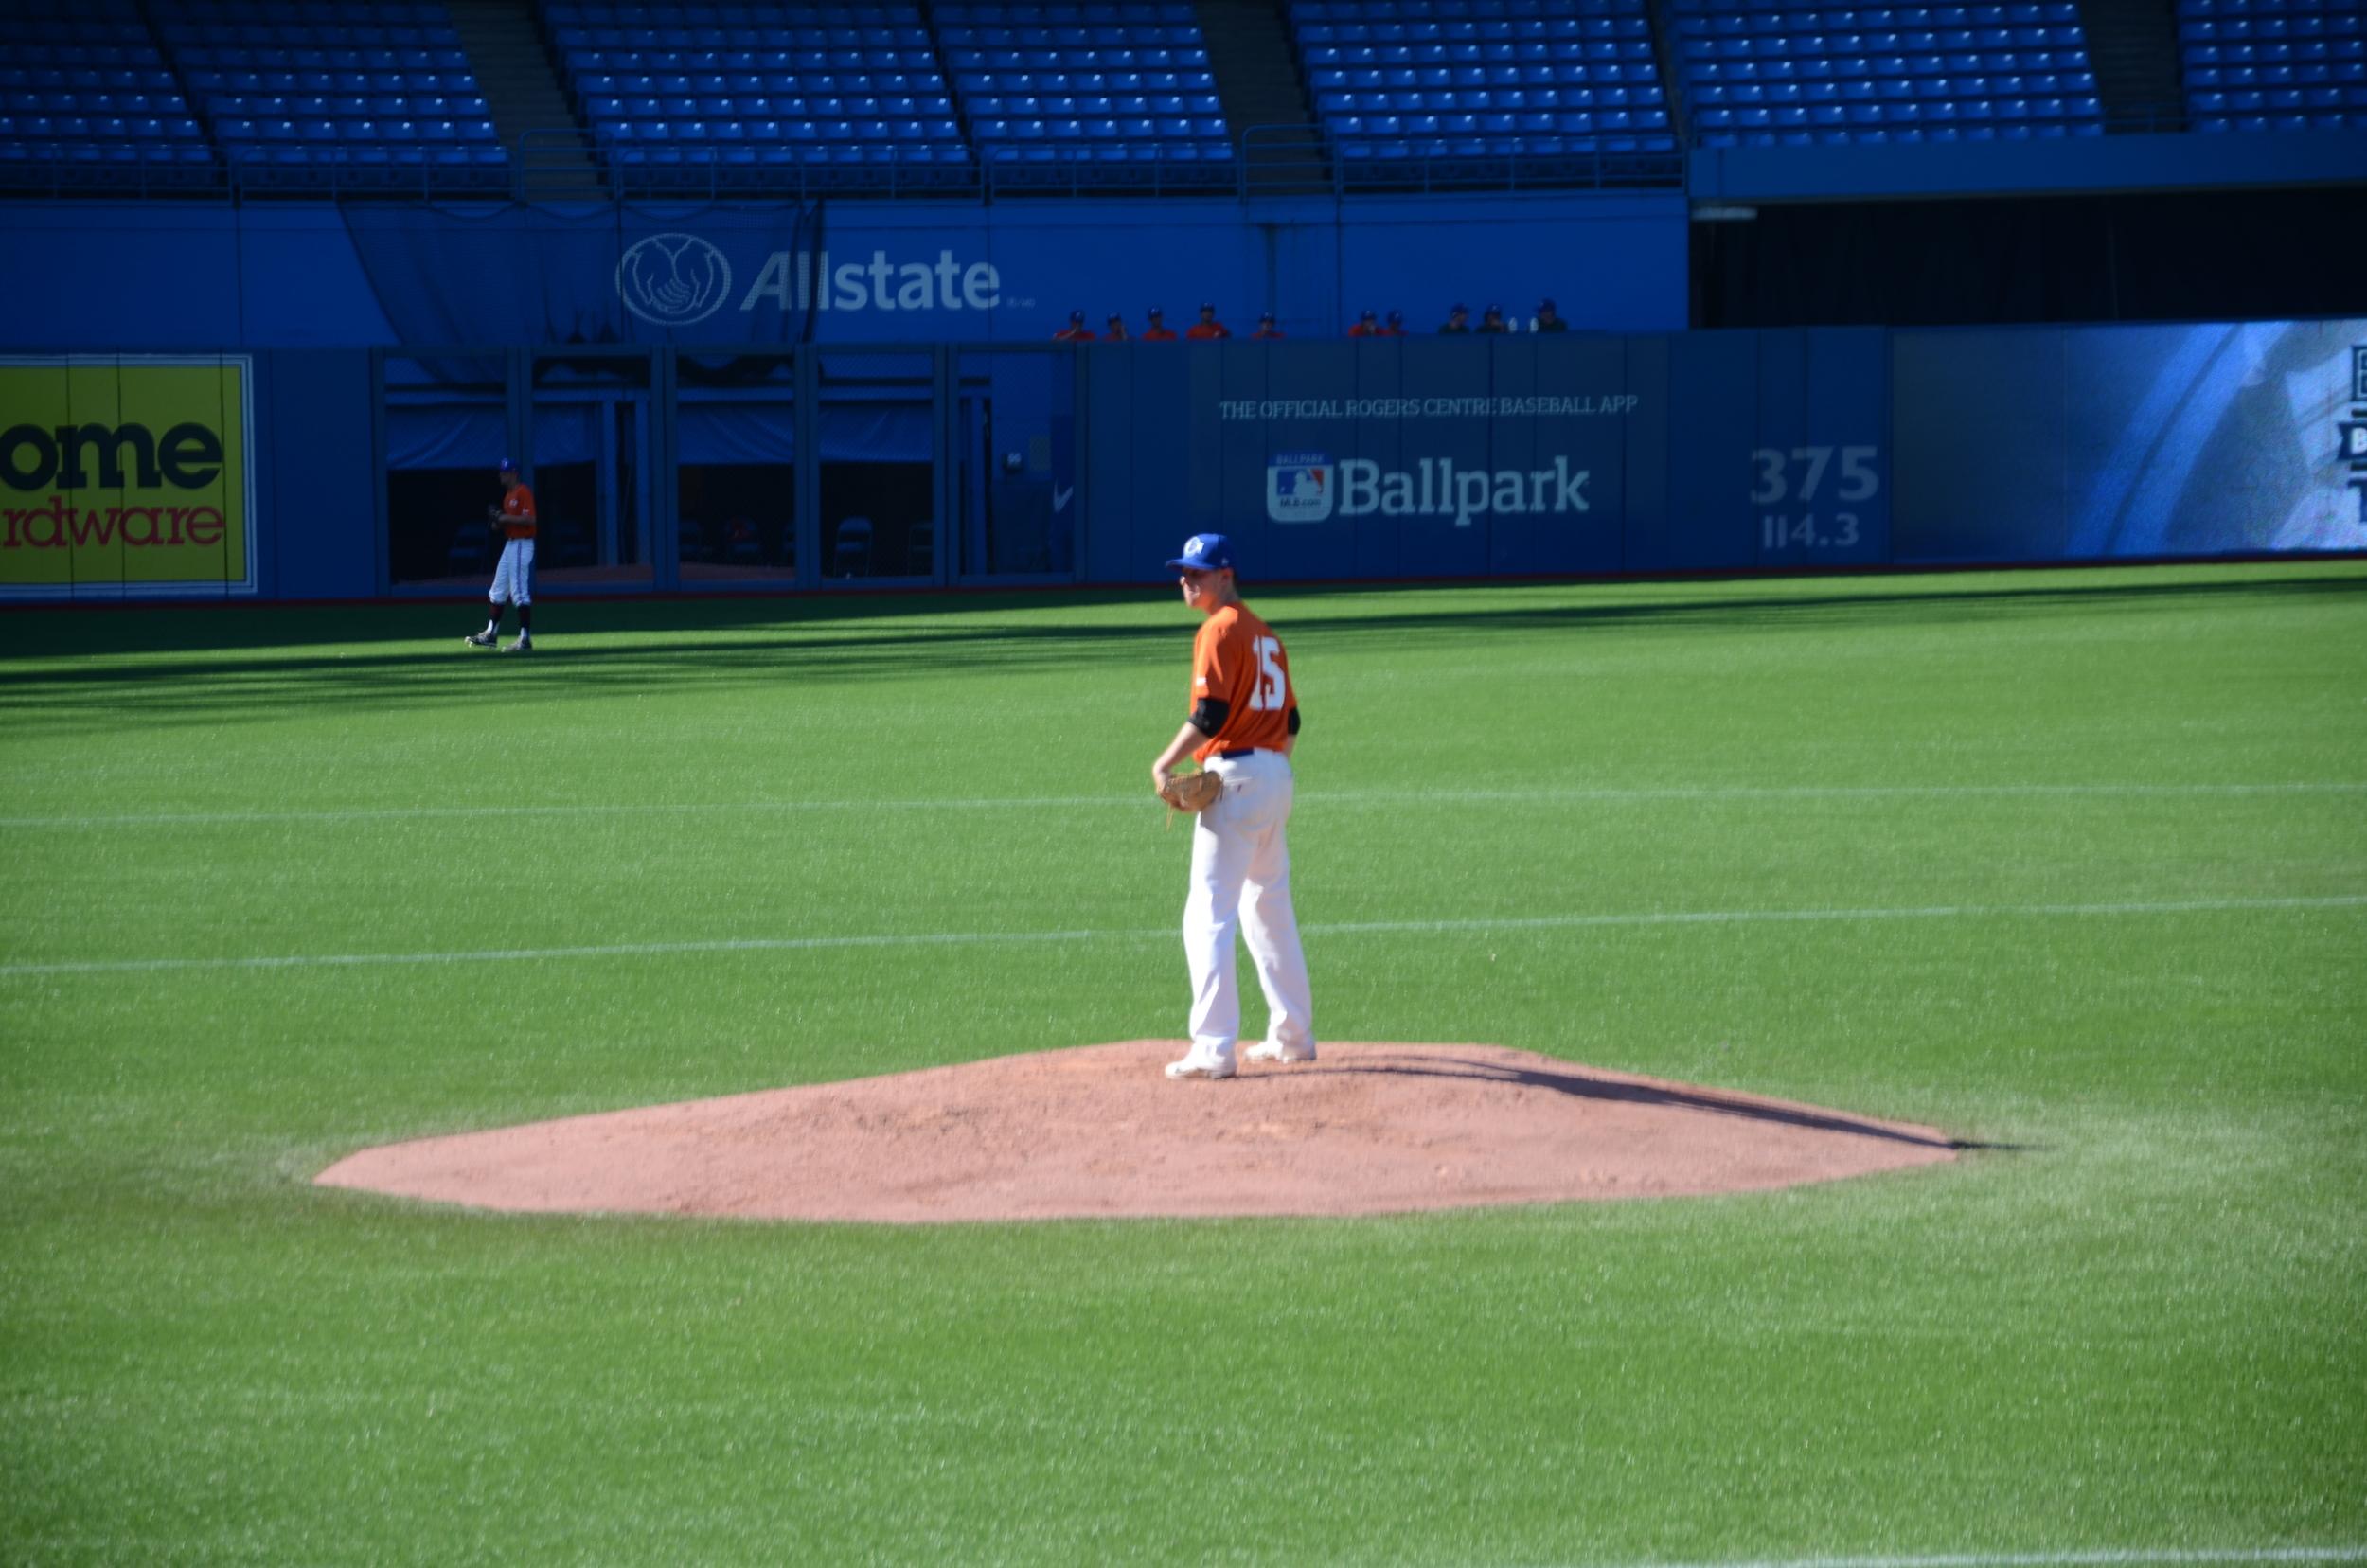 British Columbia Orange starter Tyler Hoefer (Delta, BC) of the North Delta Blue Jays readies himself to deliver a pitch. Photo:Brandan Kajioka